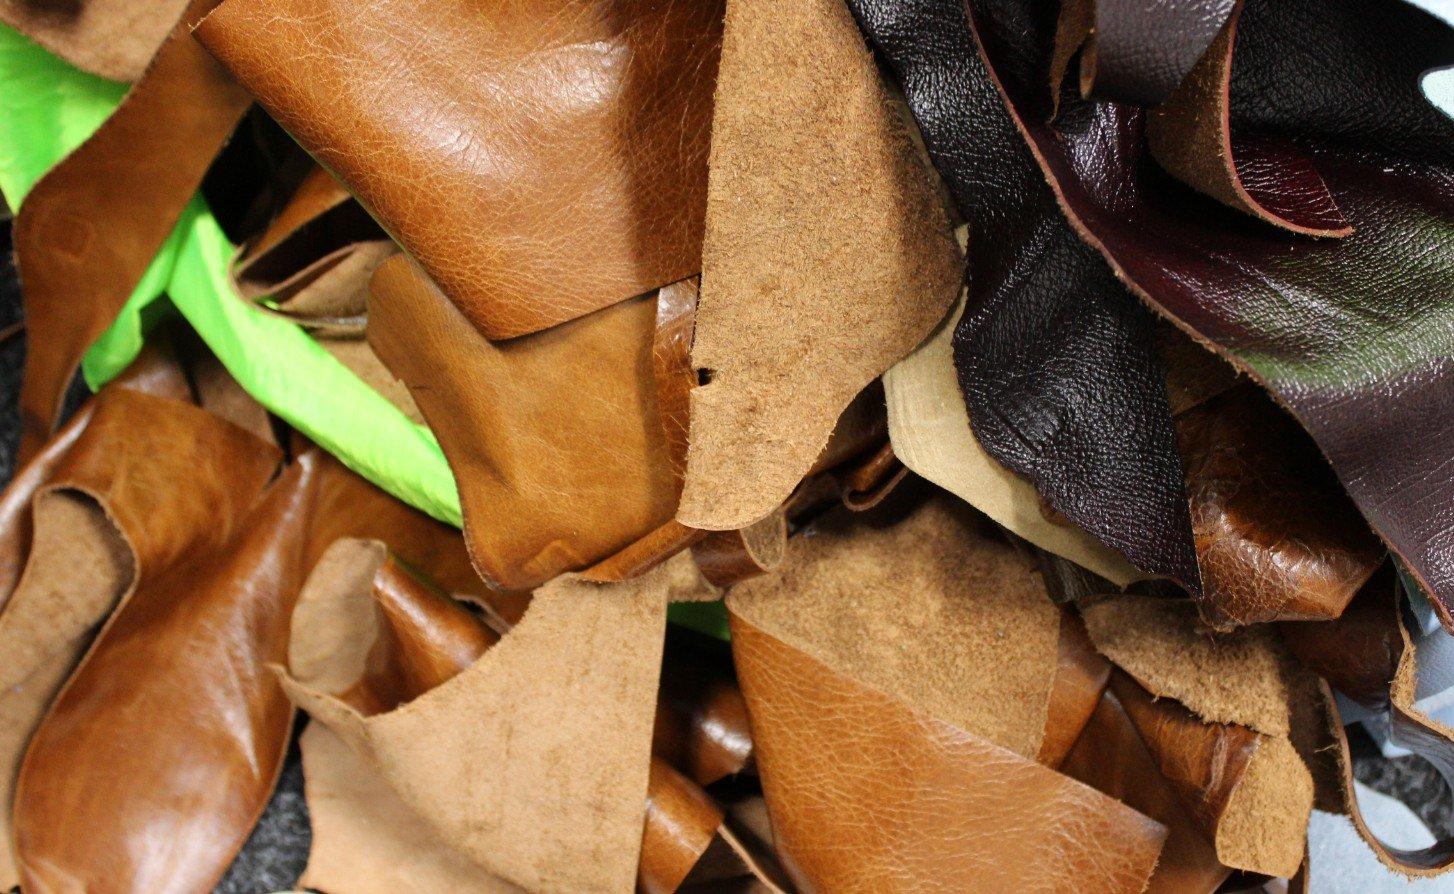 2kg Bag Of Mixed Quality Scrap Leather Arts & Crafts,Off Cuts,Remnants,Pieces Designer Sofas4u